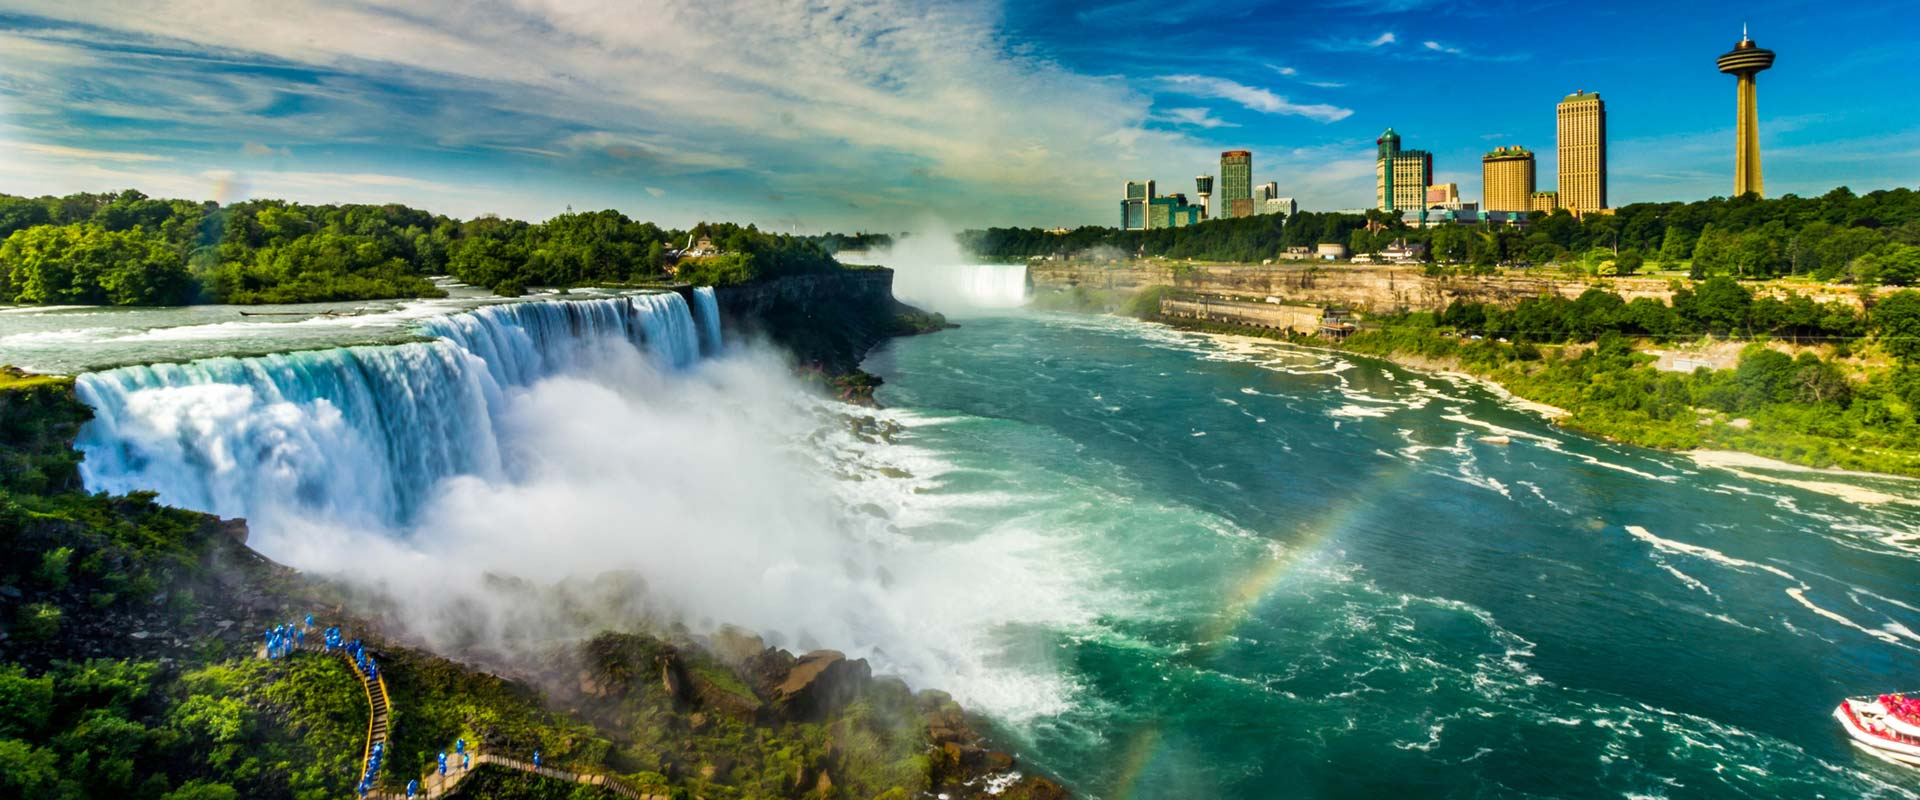 The US Side of Niagara Falls